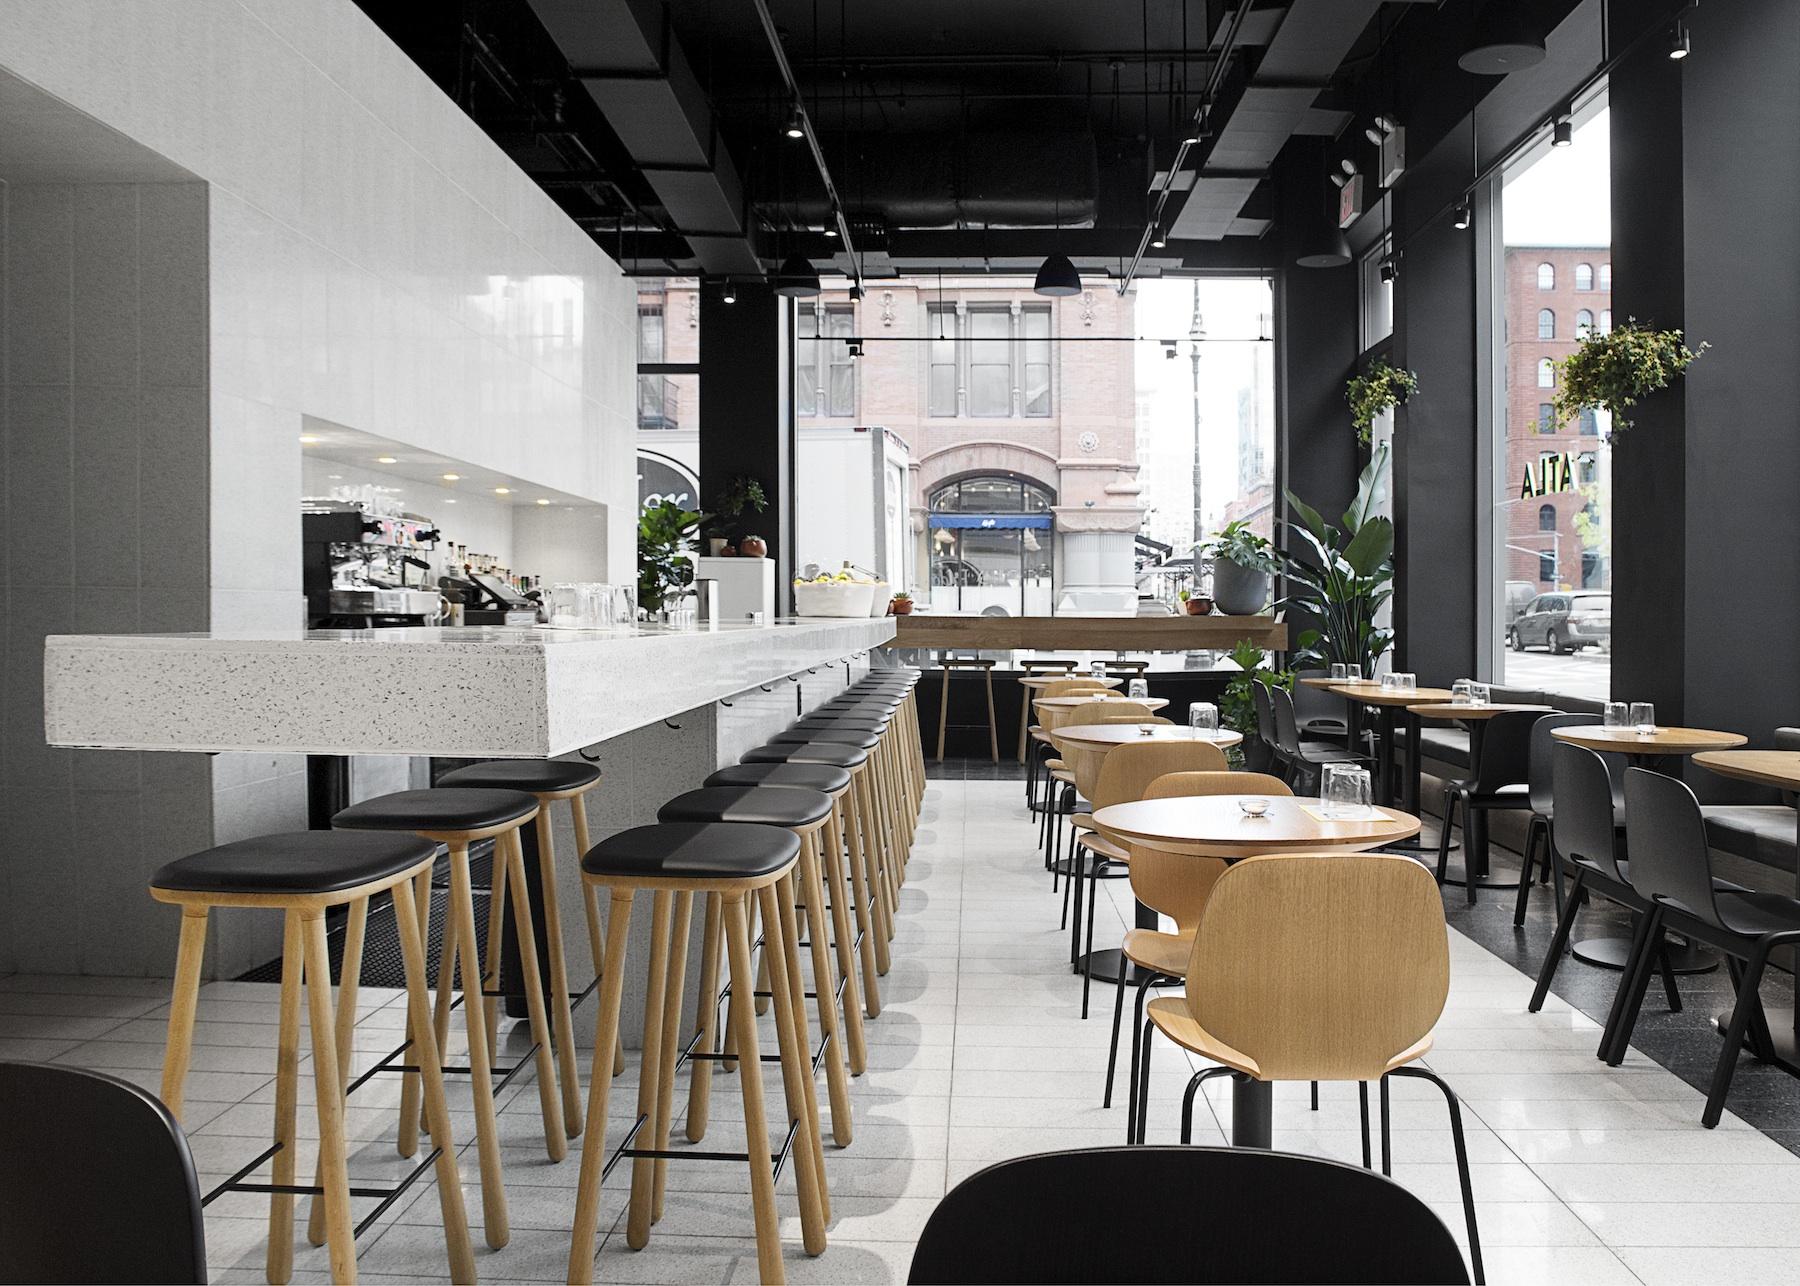 The 8 Most Instagrammable New Breakfast Spots in NYC - Zagat